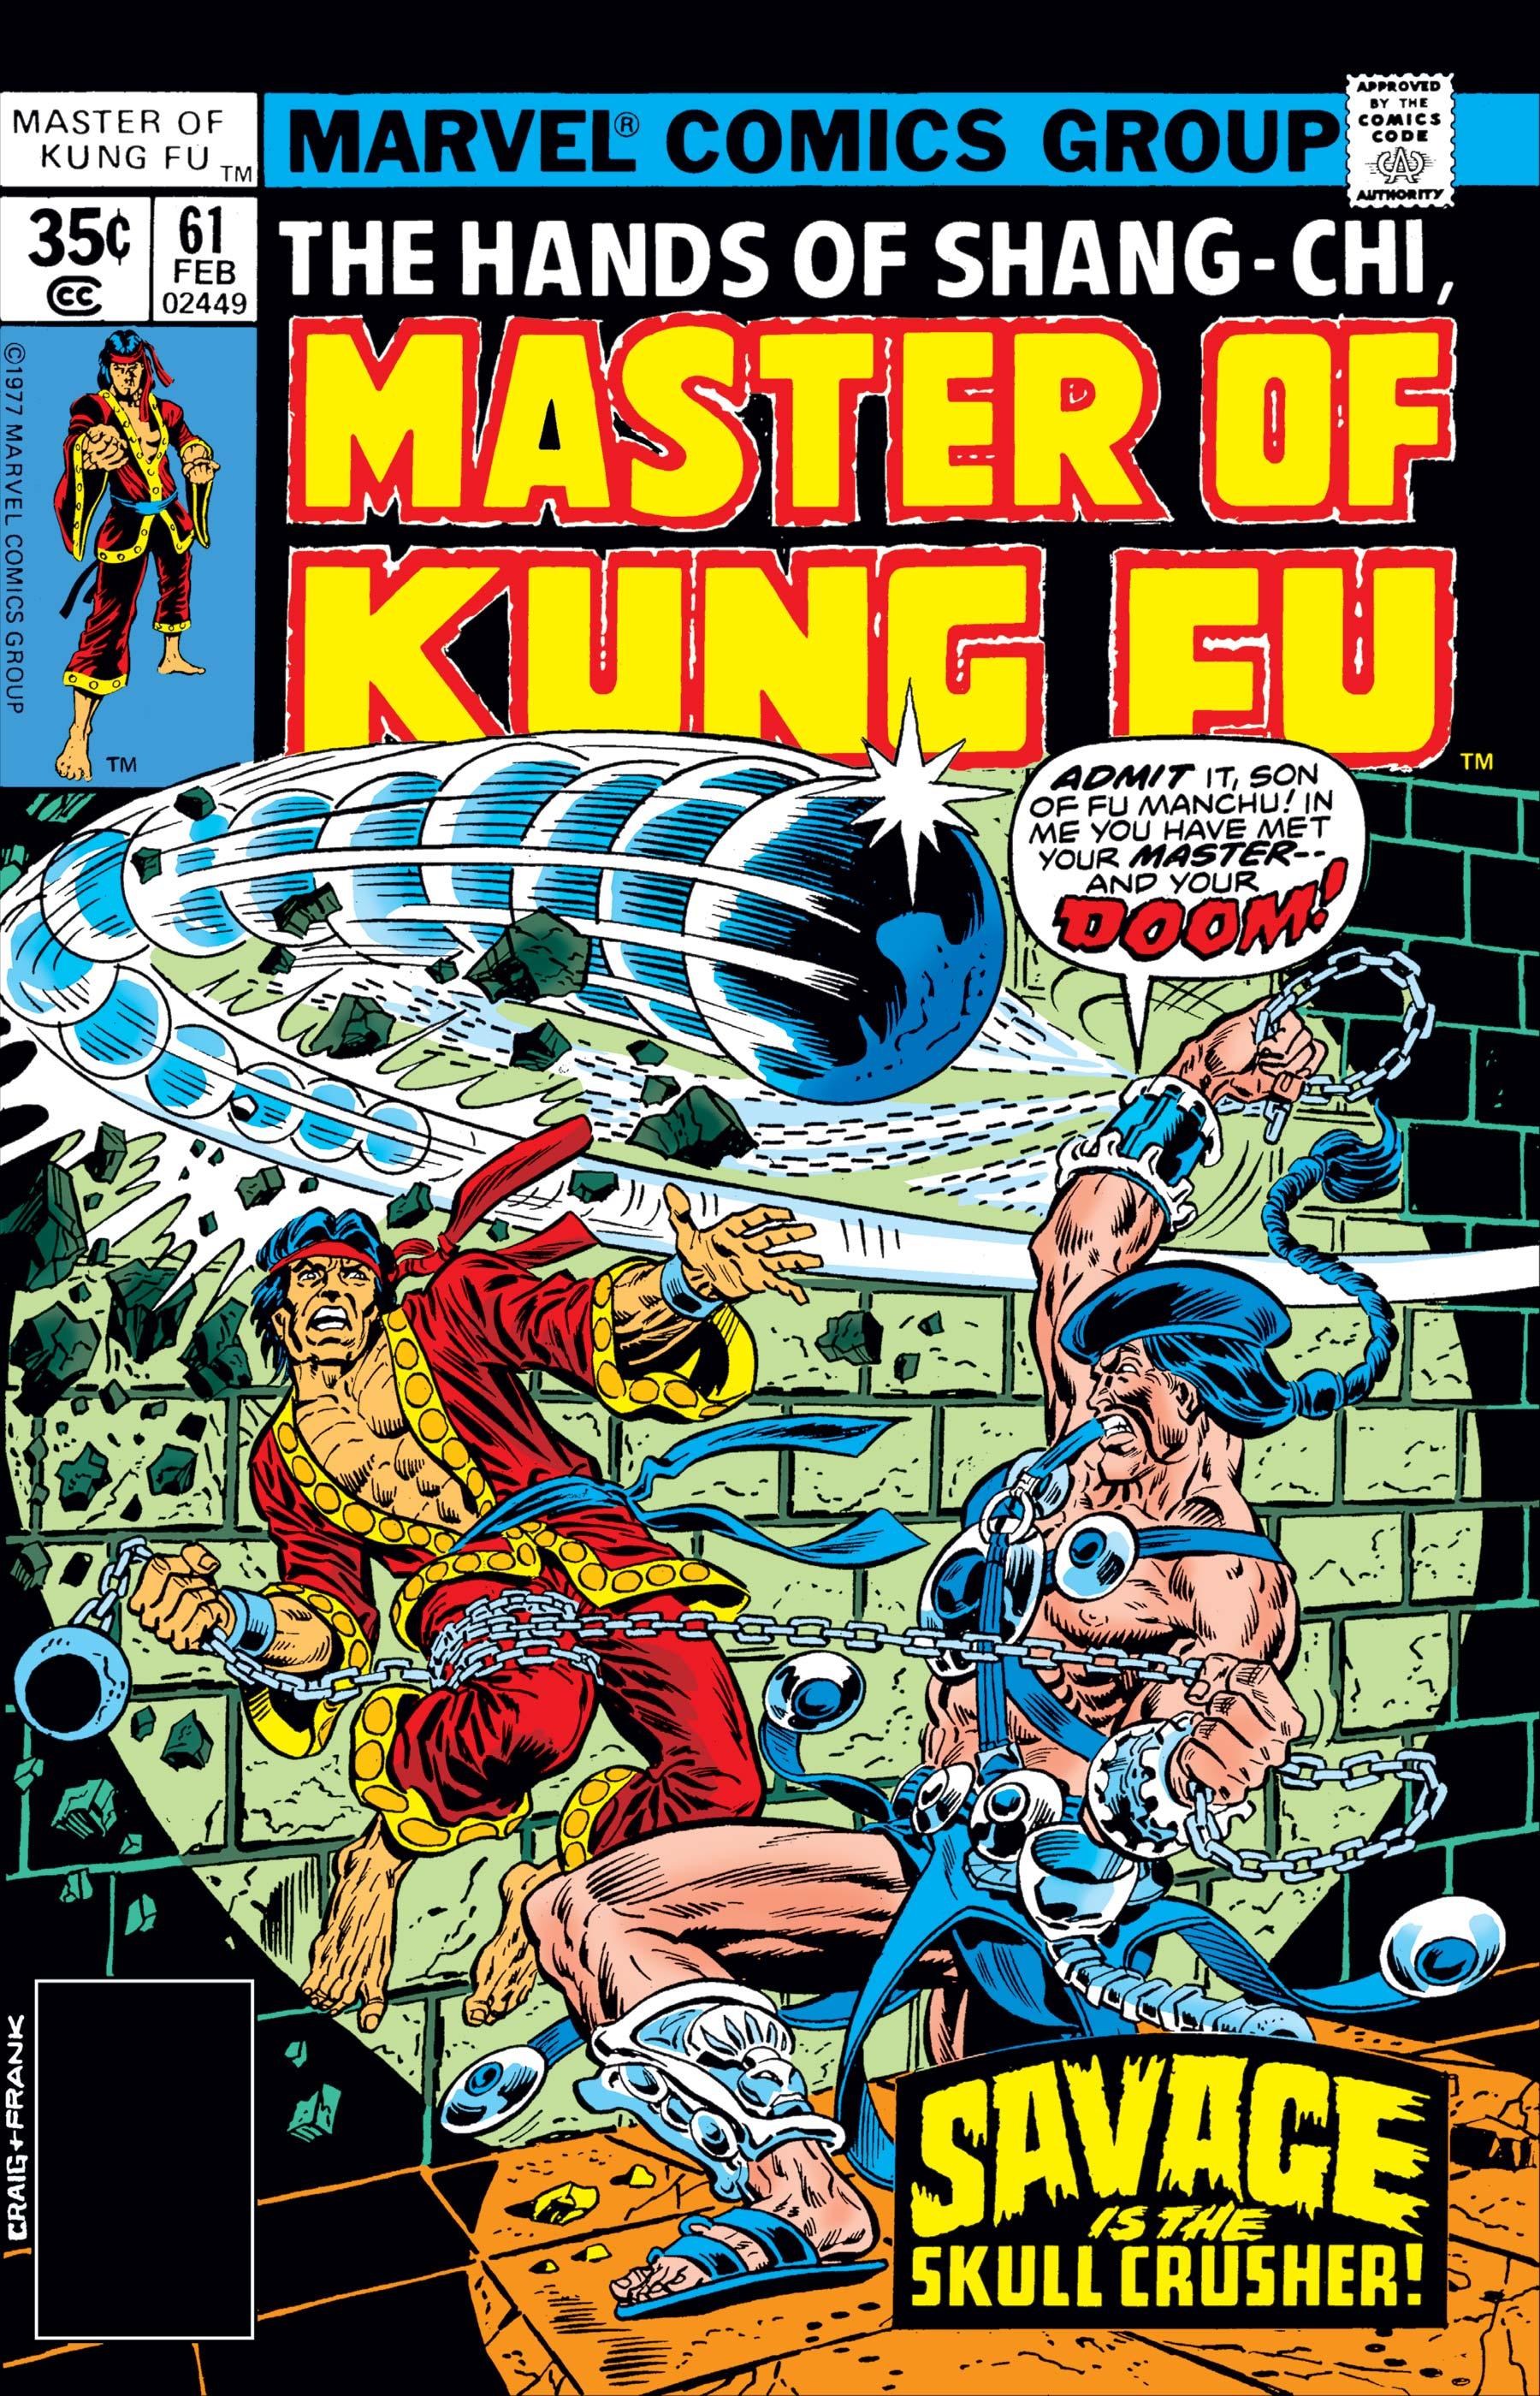 Master of Kung Fu (1974) #61